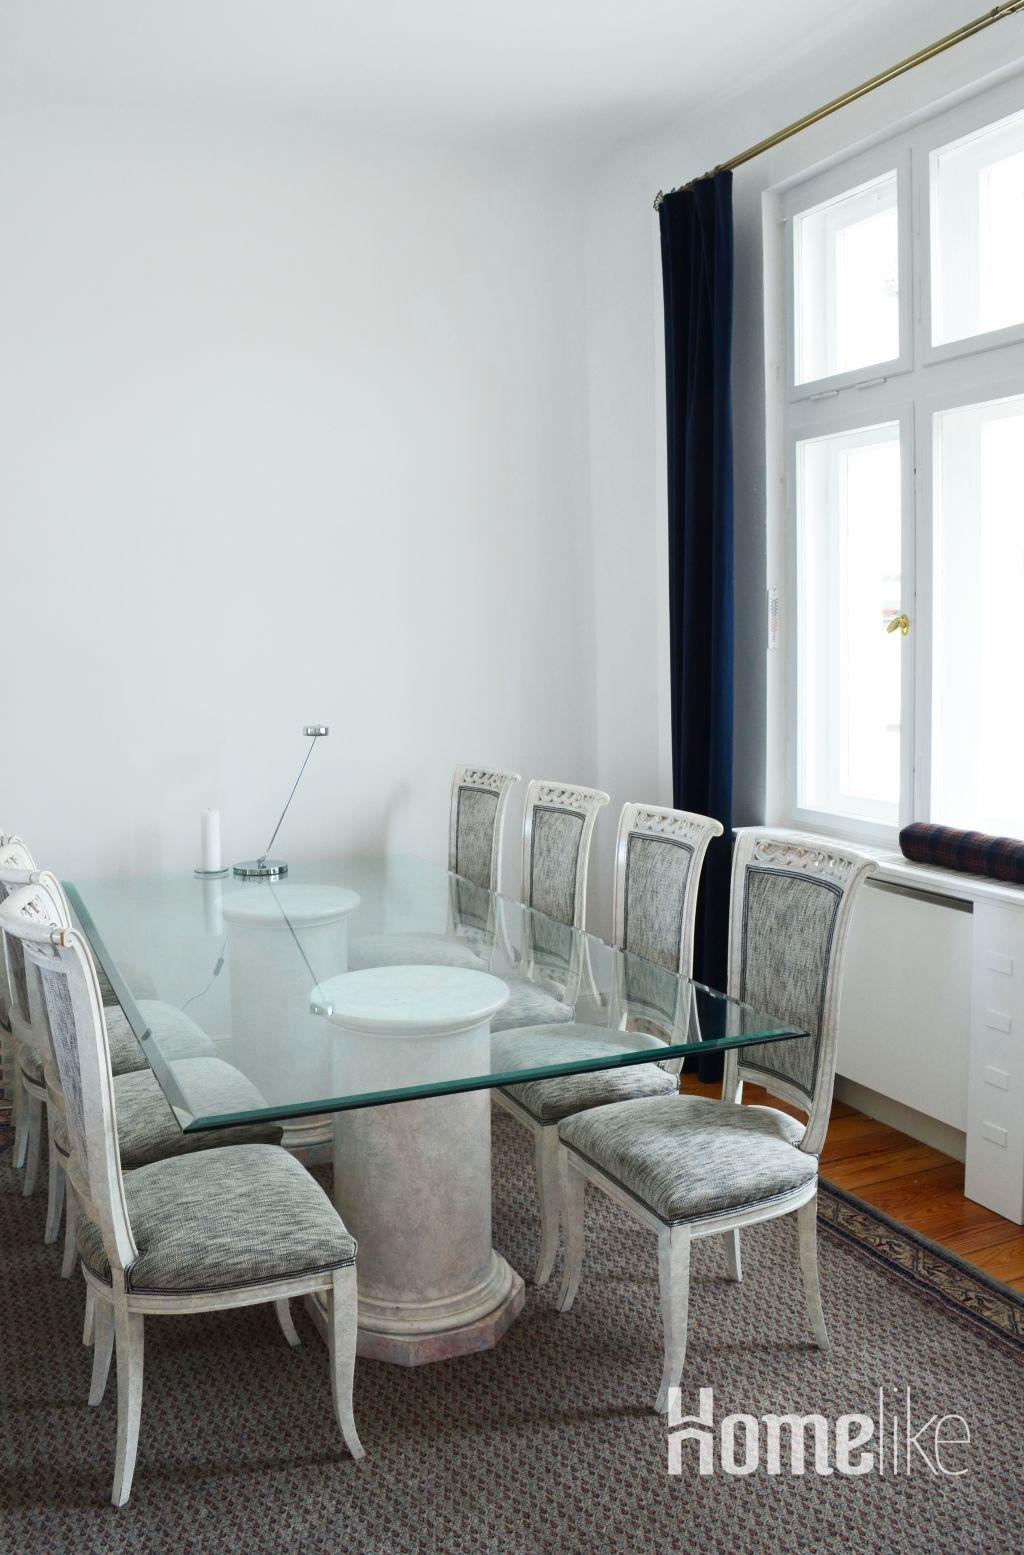 image 3 furnished 2 bedroom Apartment for rent in Barth, Nordvorpommern